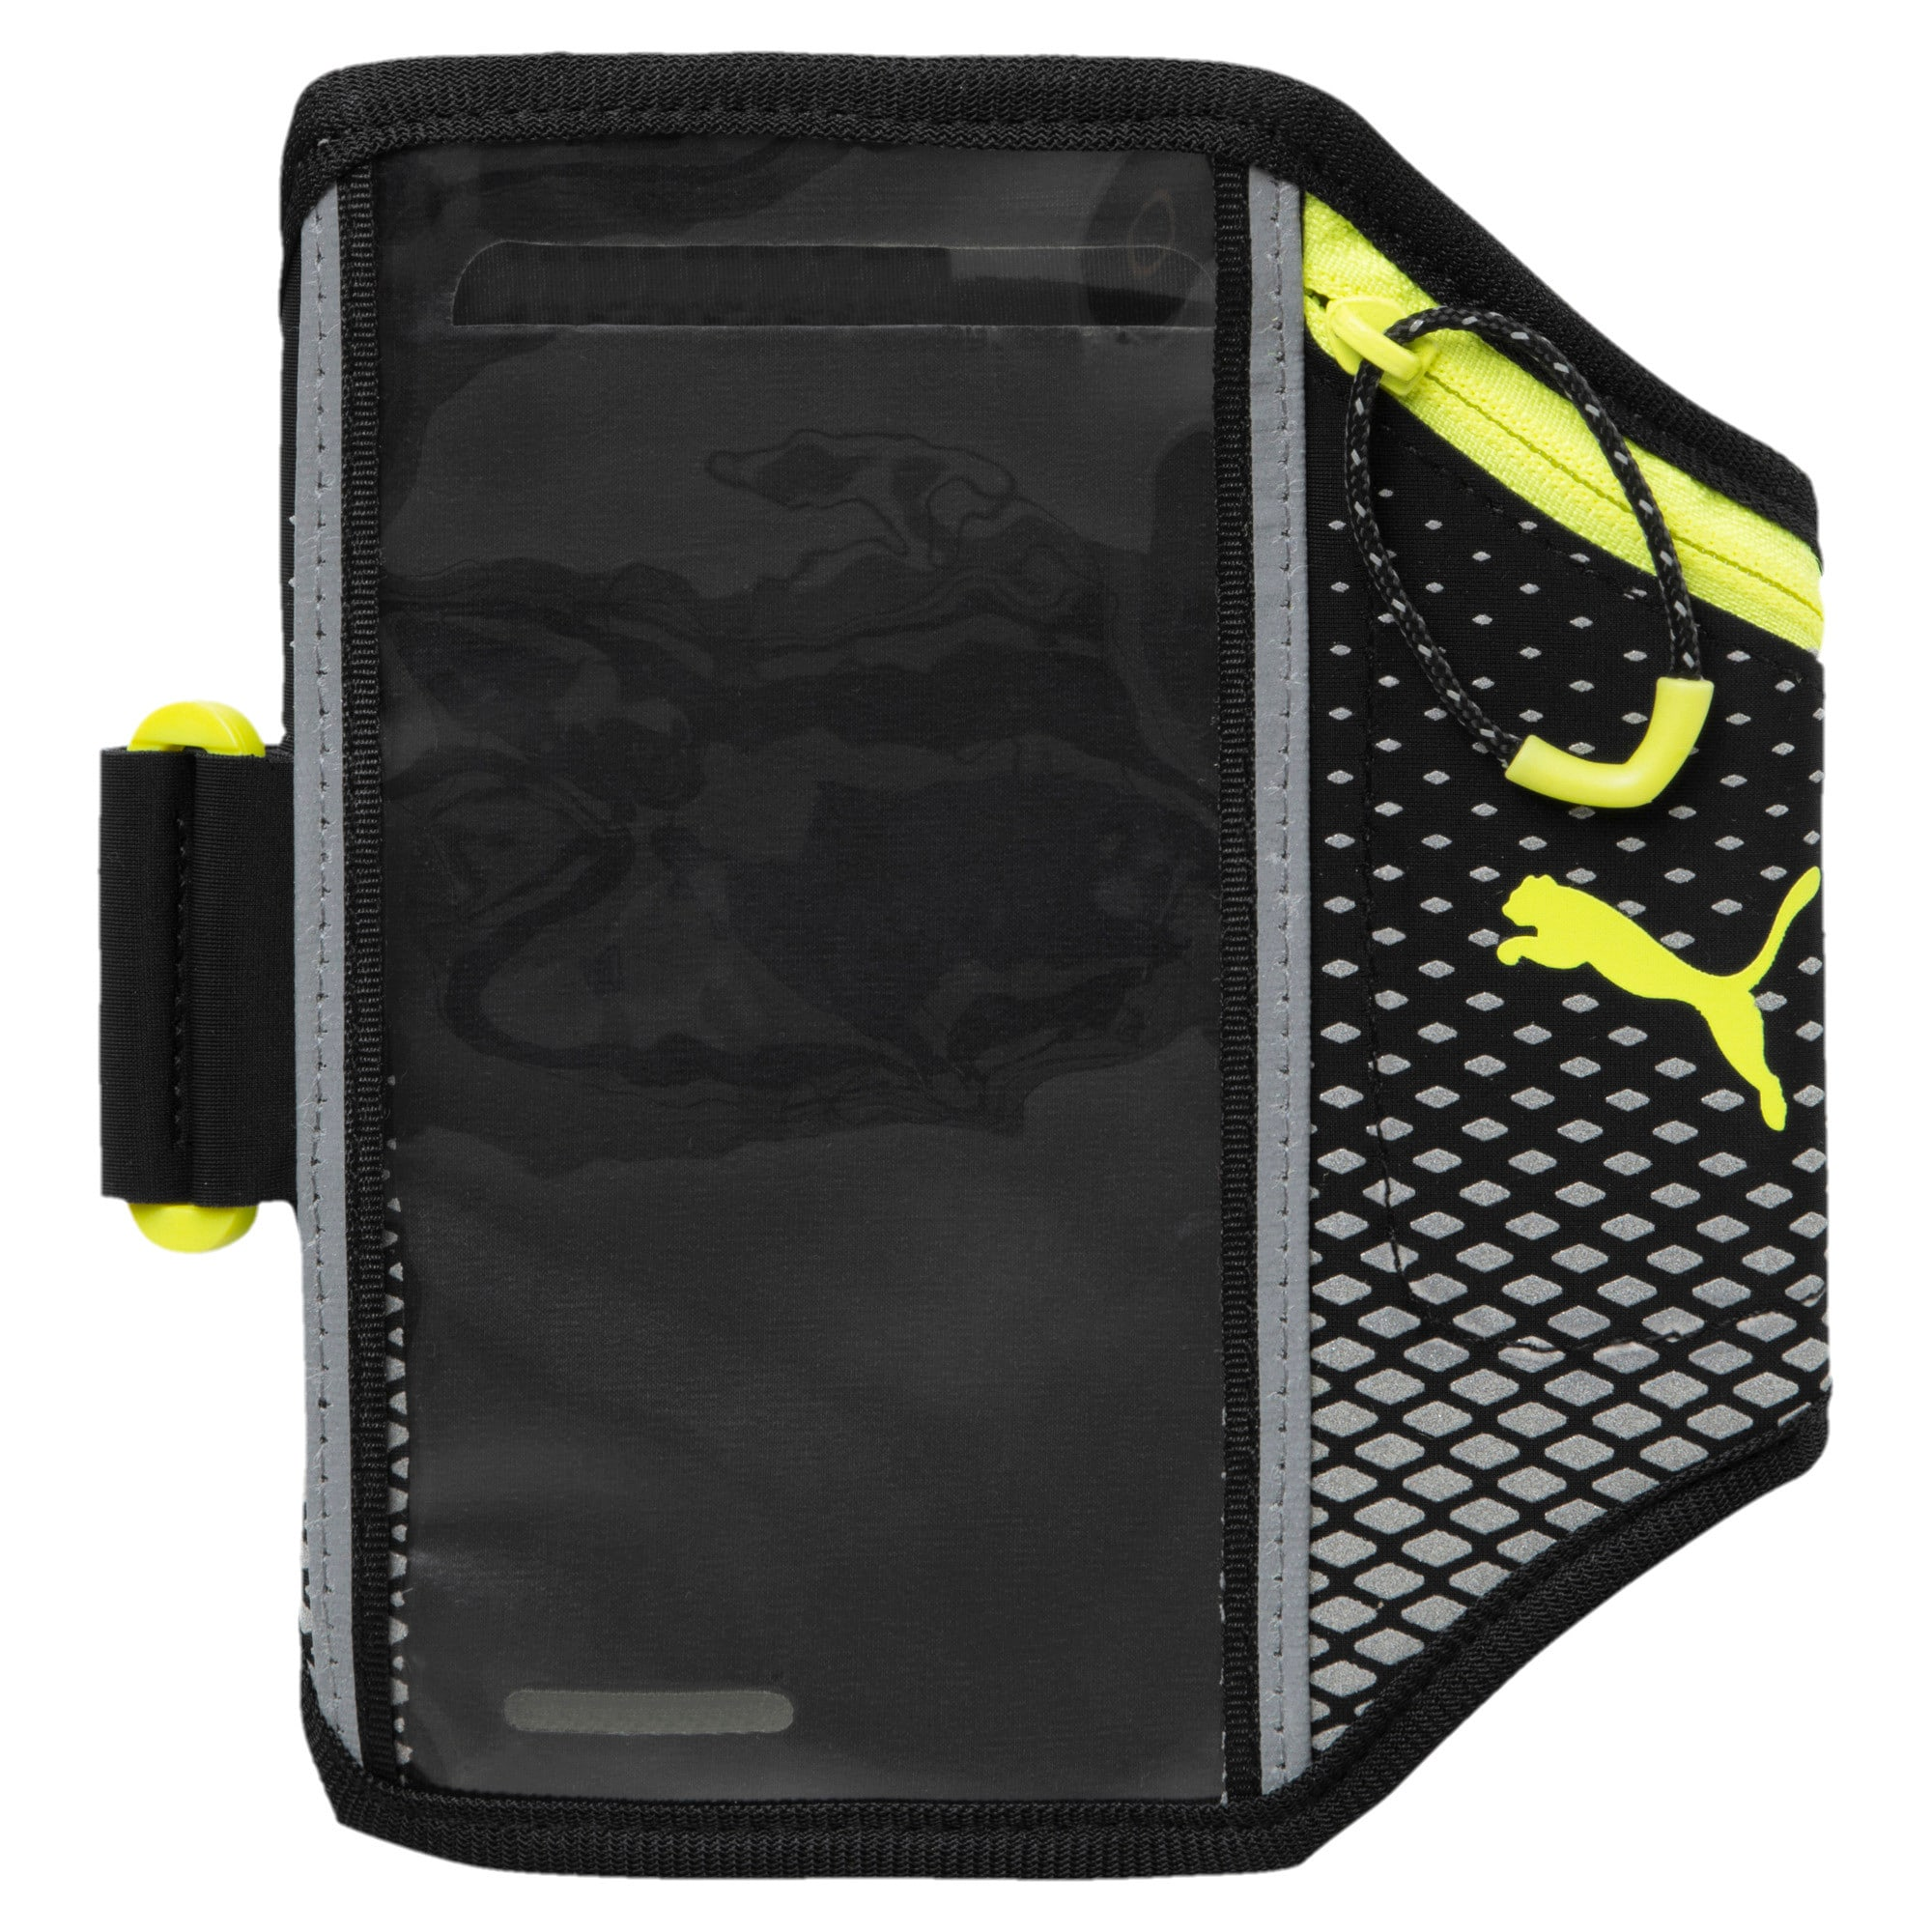 Thumbnail 1 of Running Phone Armband, Black-nrgy yellow-nightcat, medium-IND